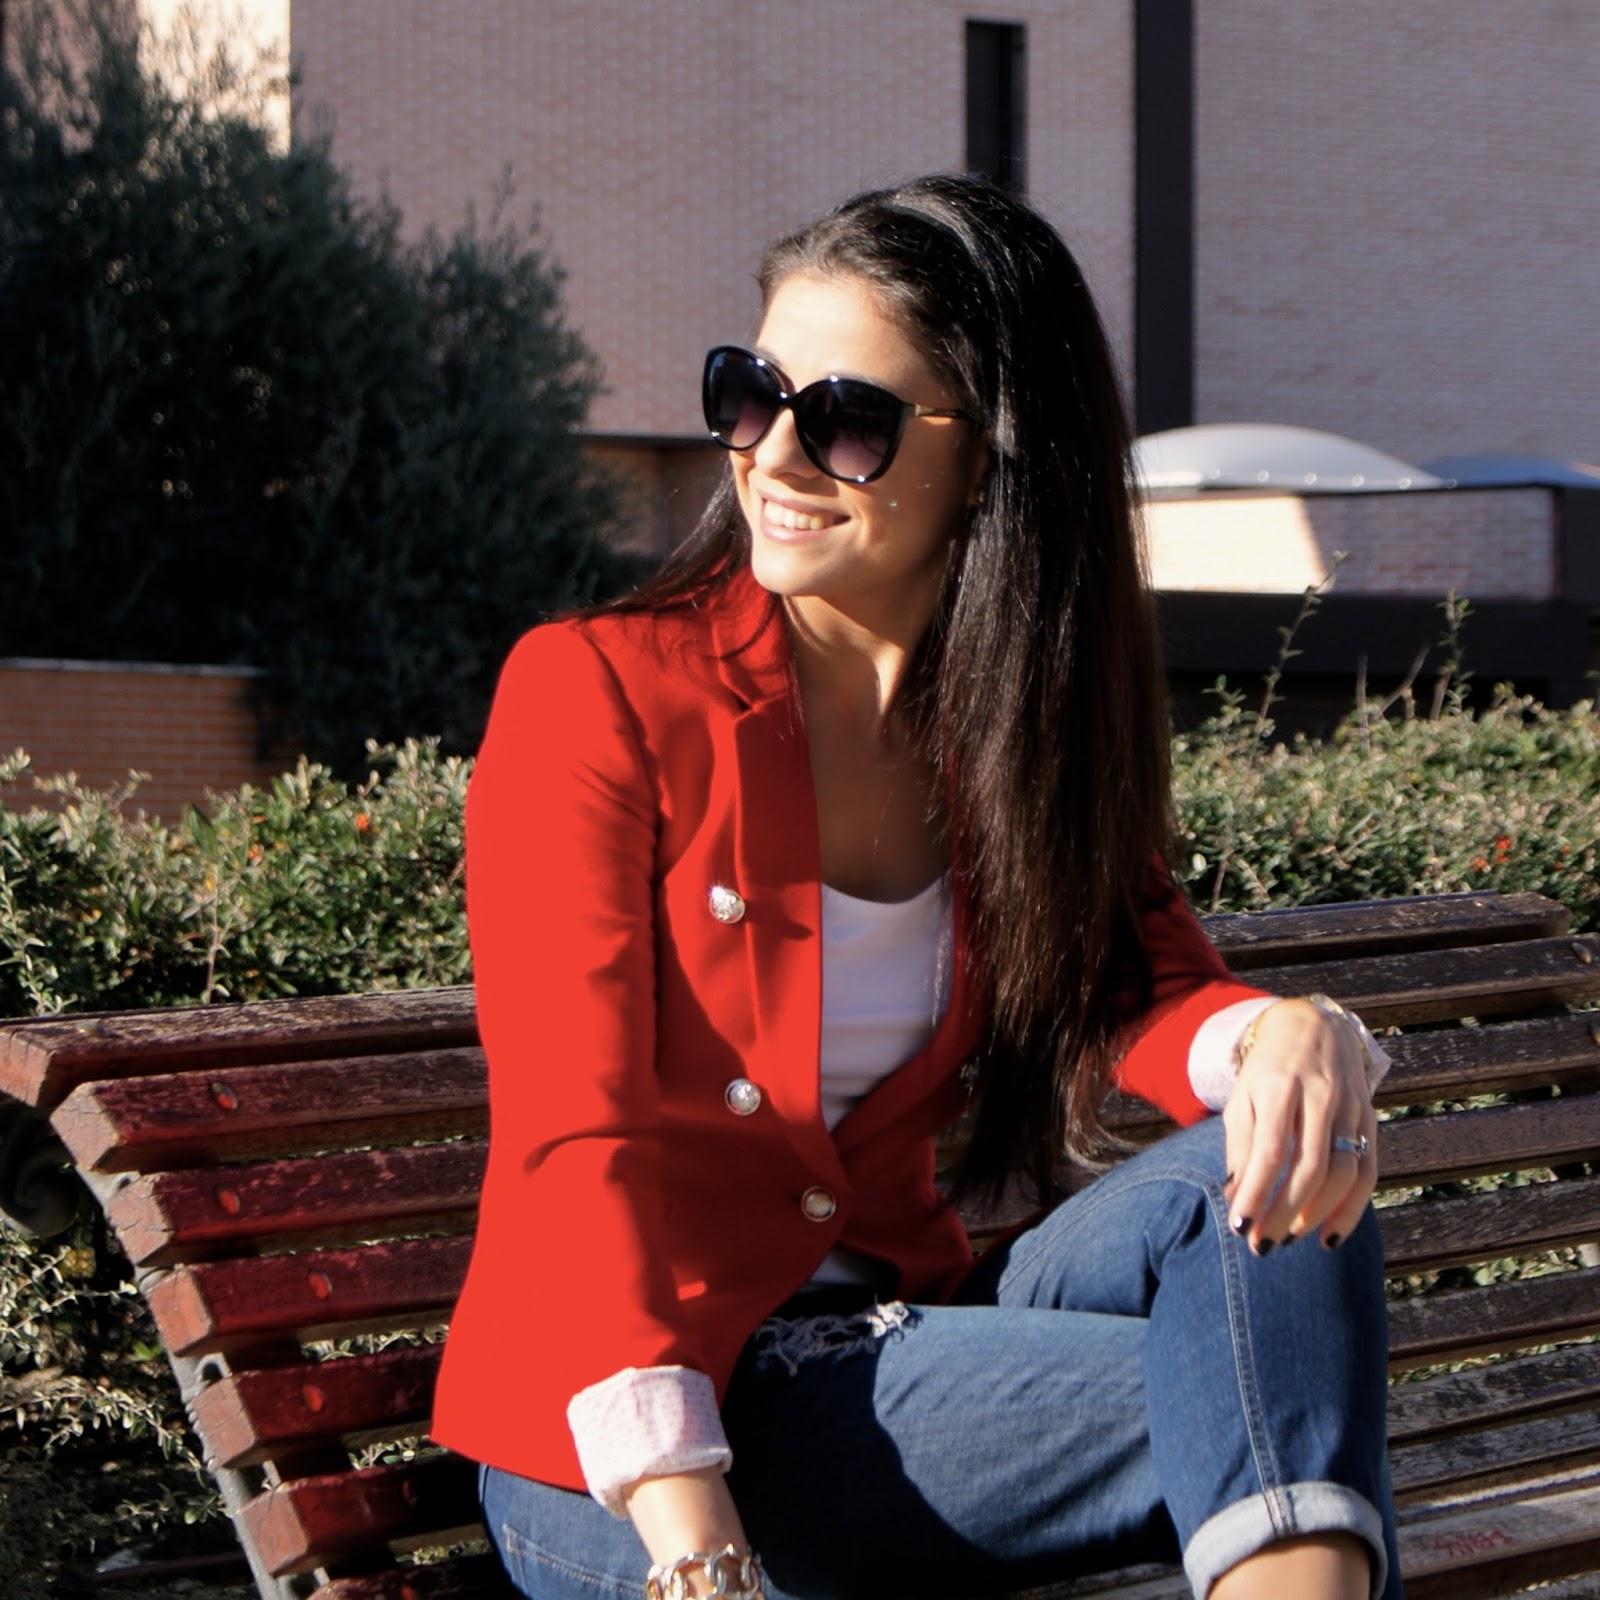 la-caprichossa-blog-de-moda-otoño-2014-chaqueta-roja-zapatos-azules